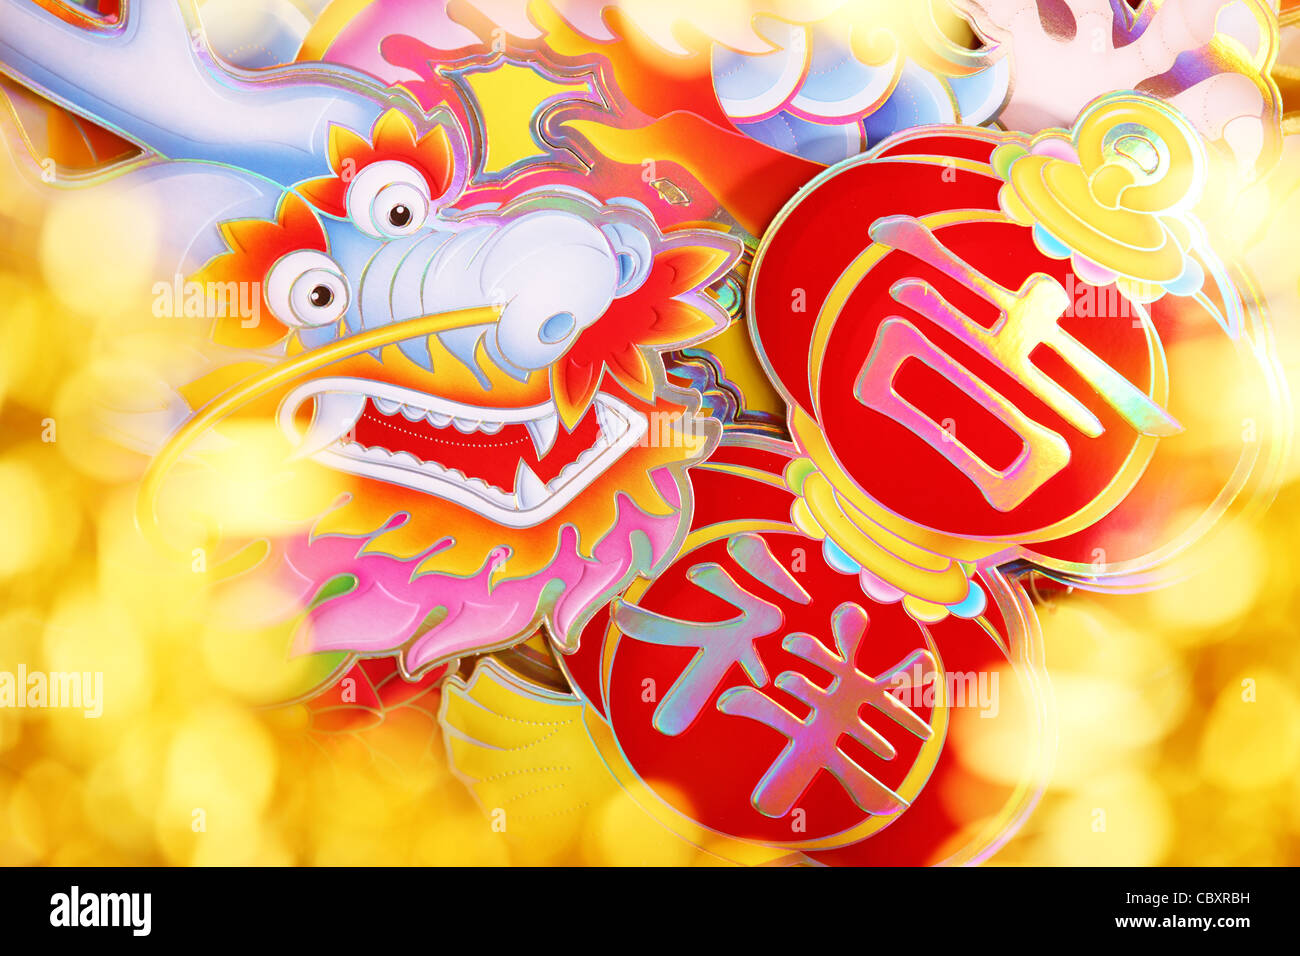 Background Dragon China Chinese Stockfotos & Background Dragon China ...